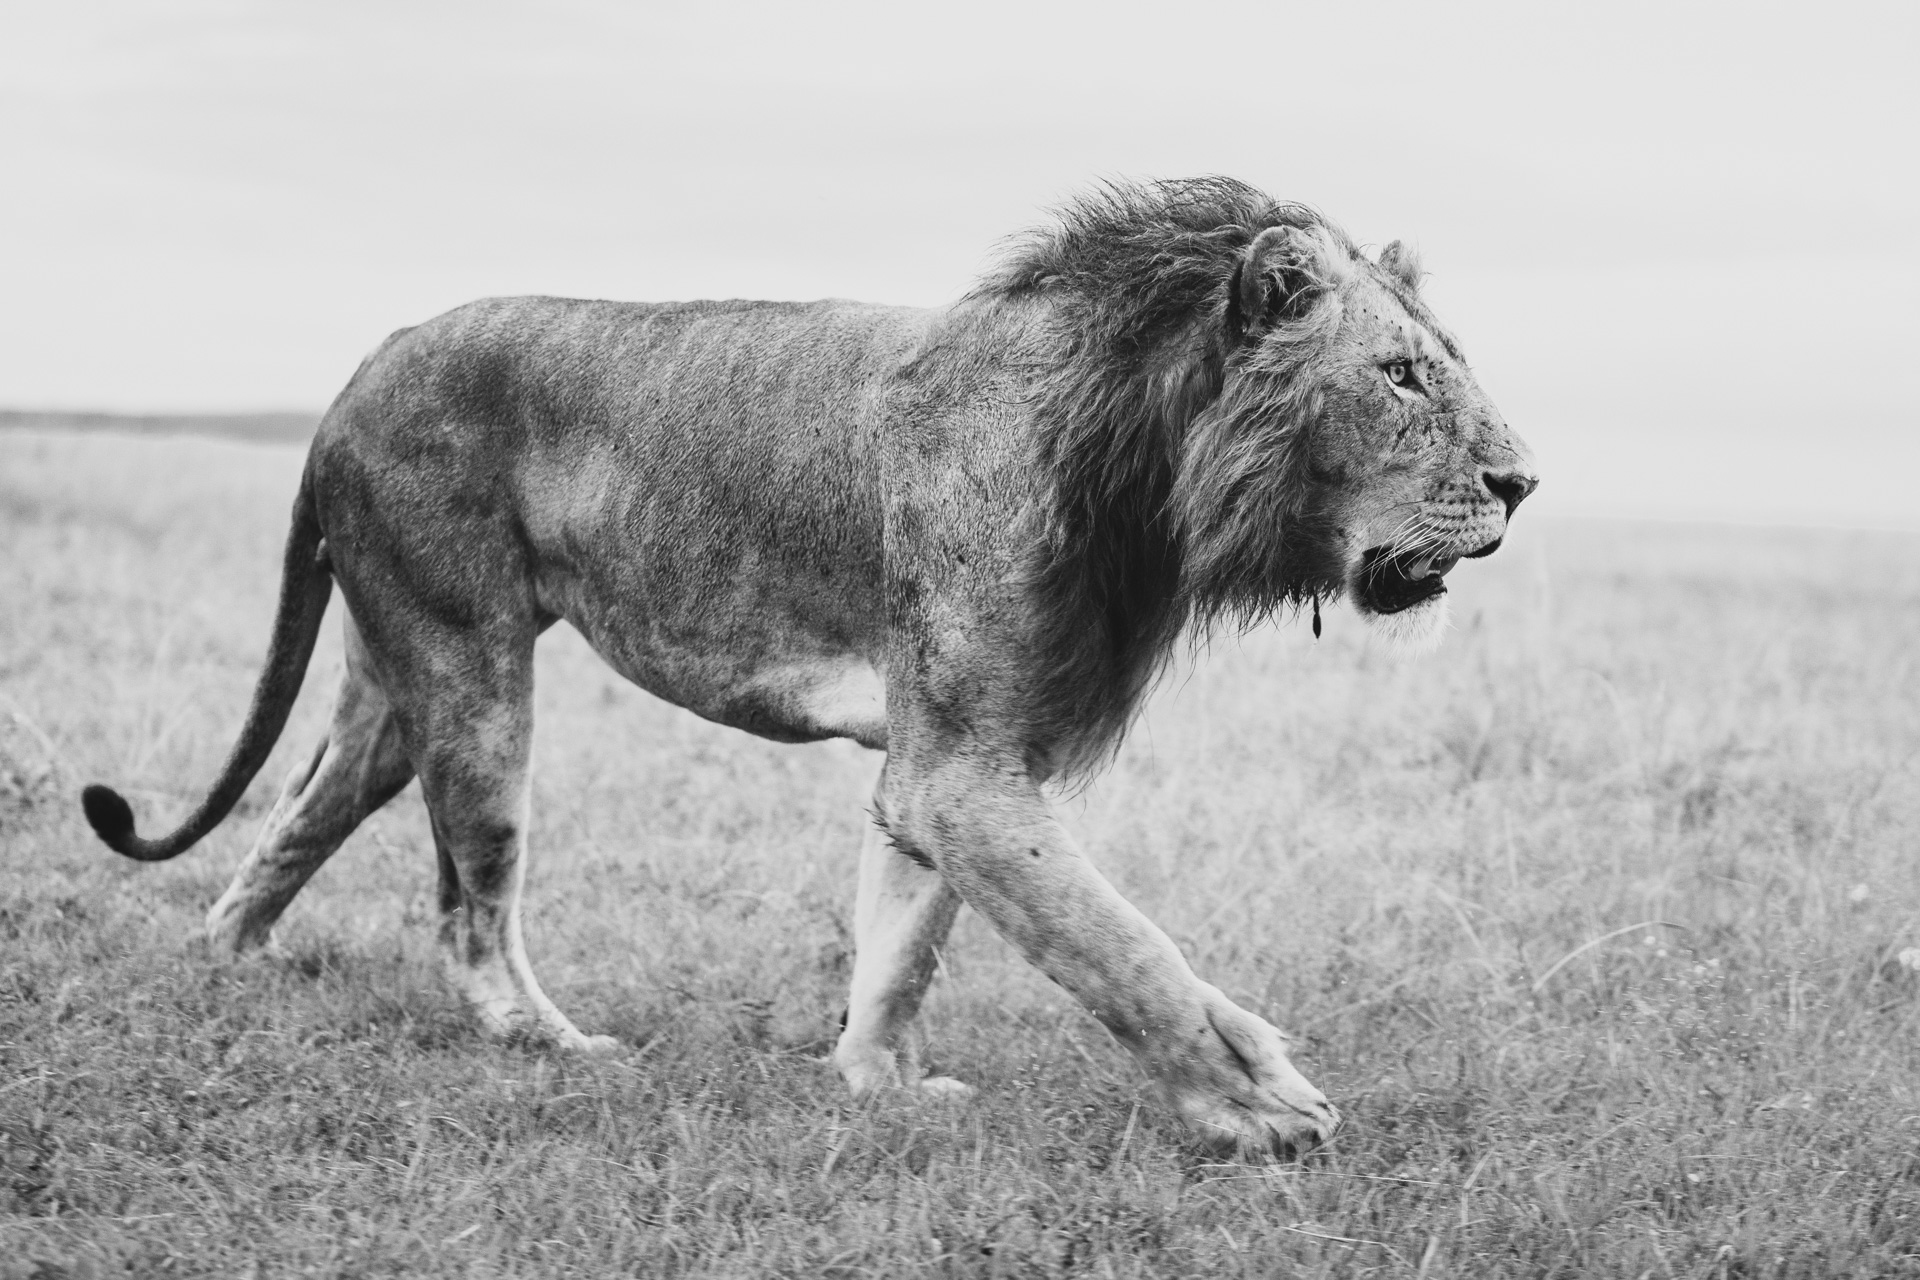 lion in bw side on